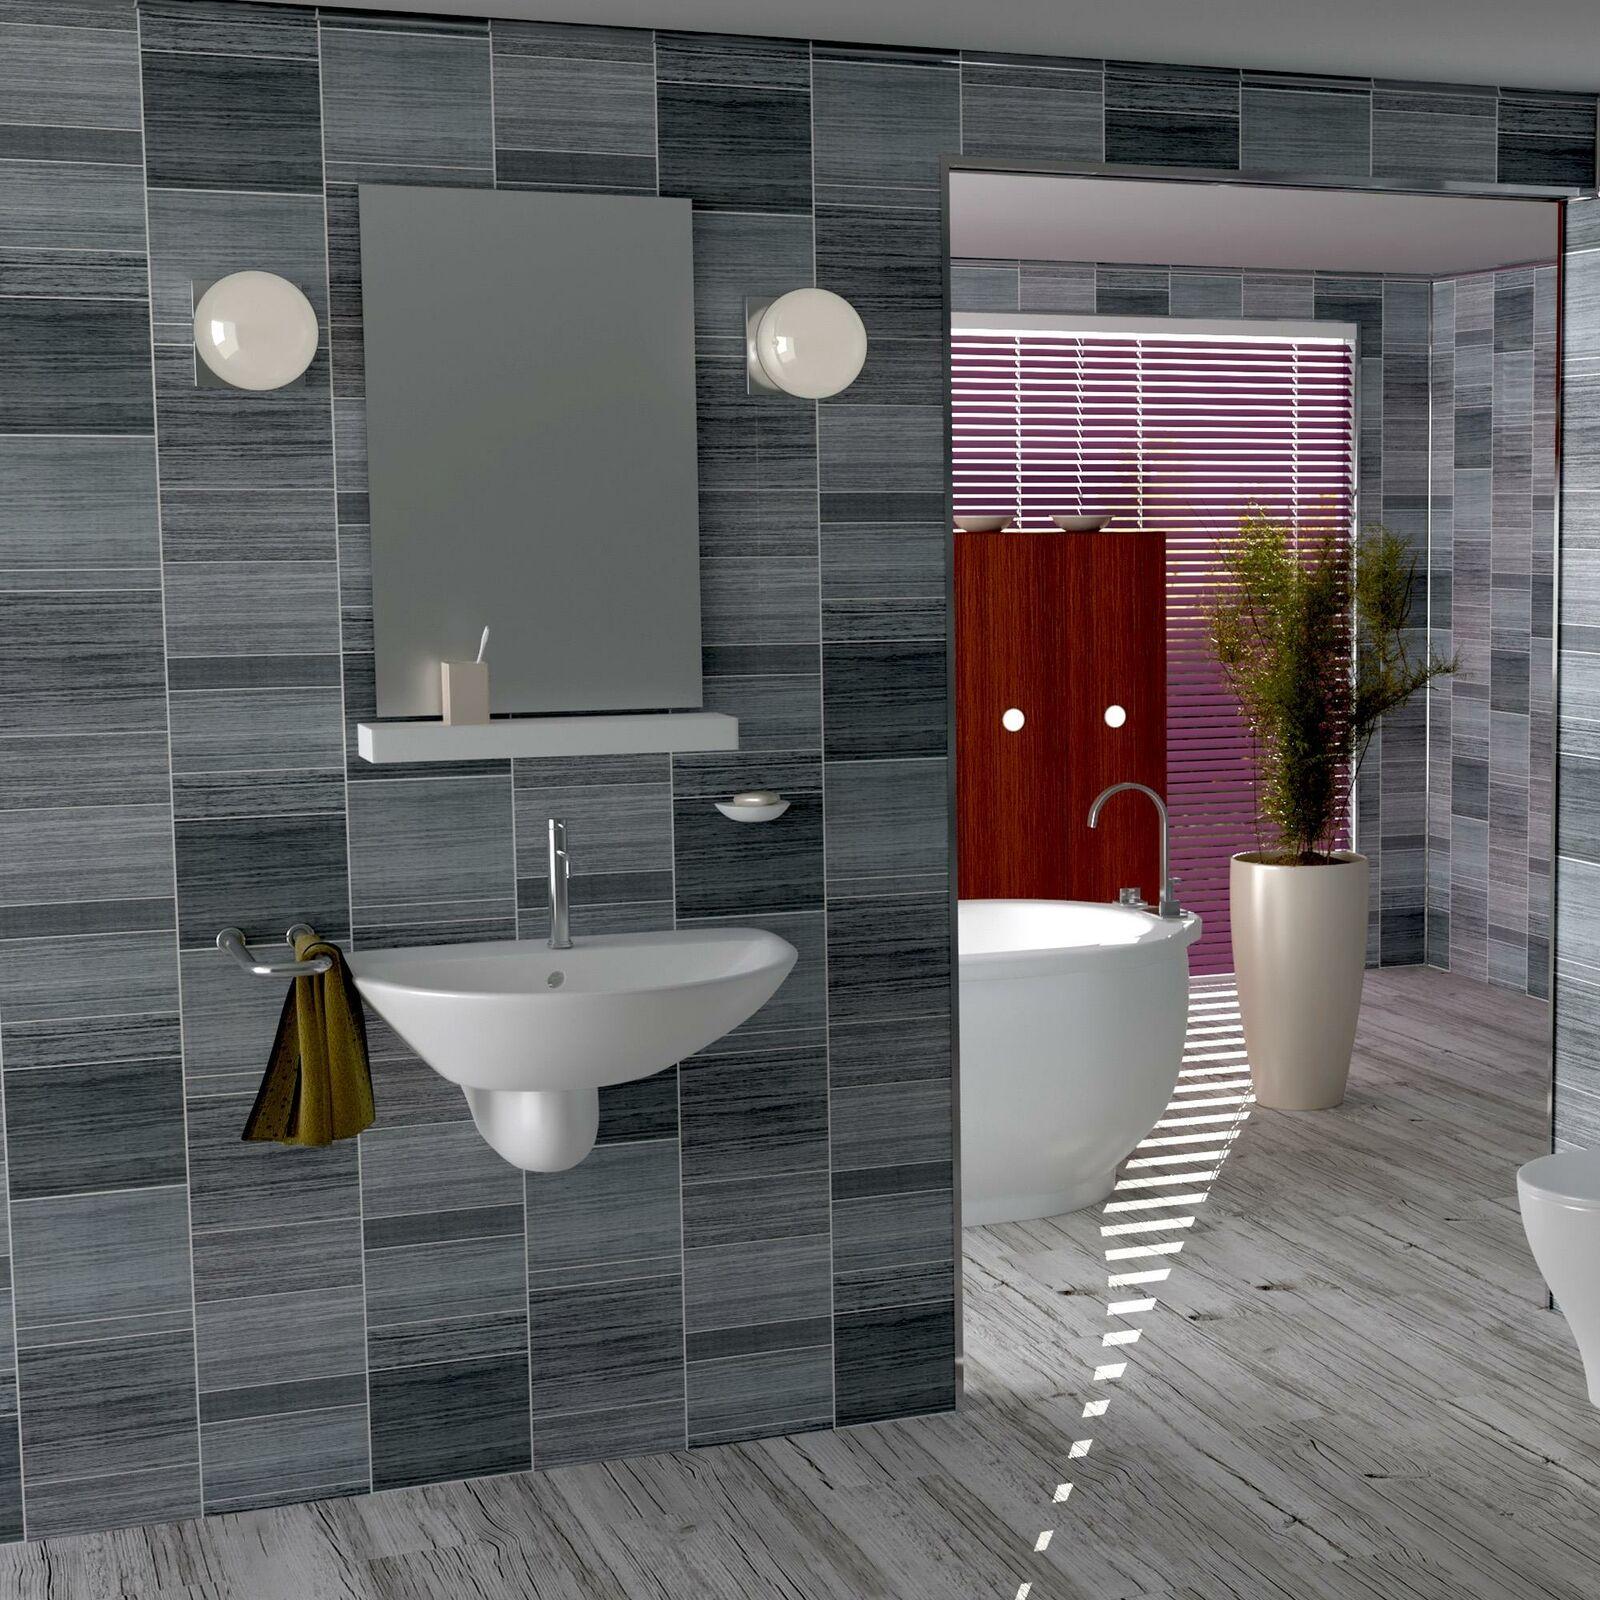 executive grey tile effect bathroom cladding panels wet